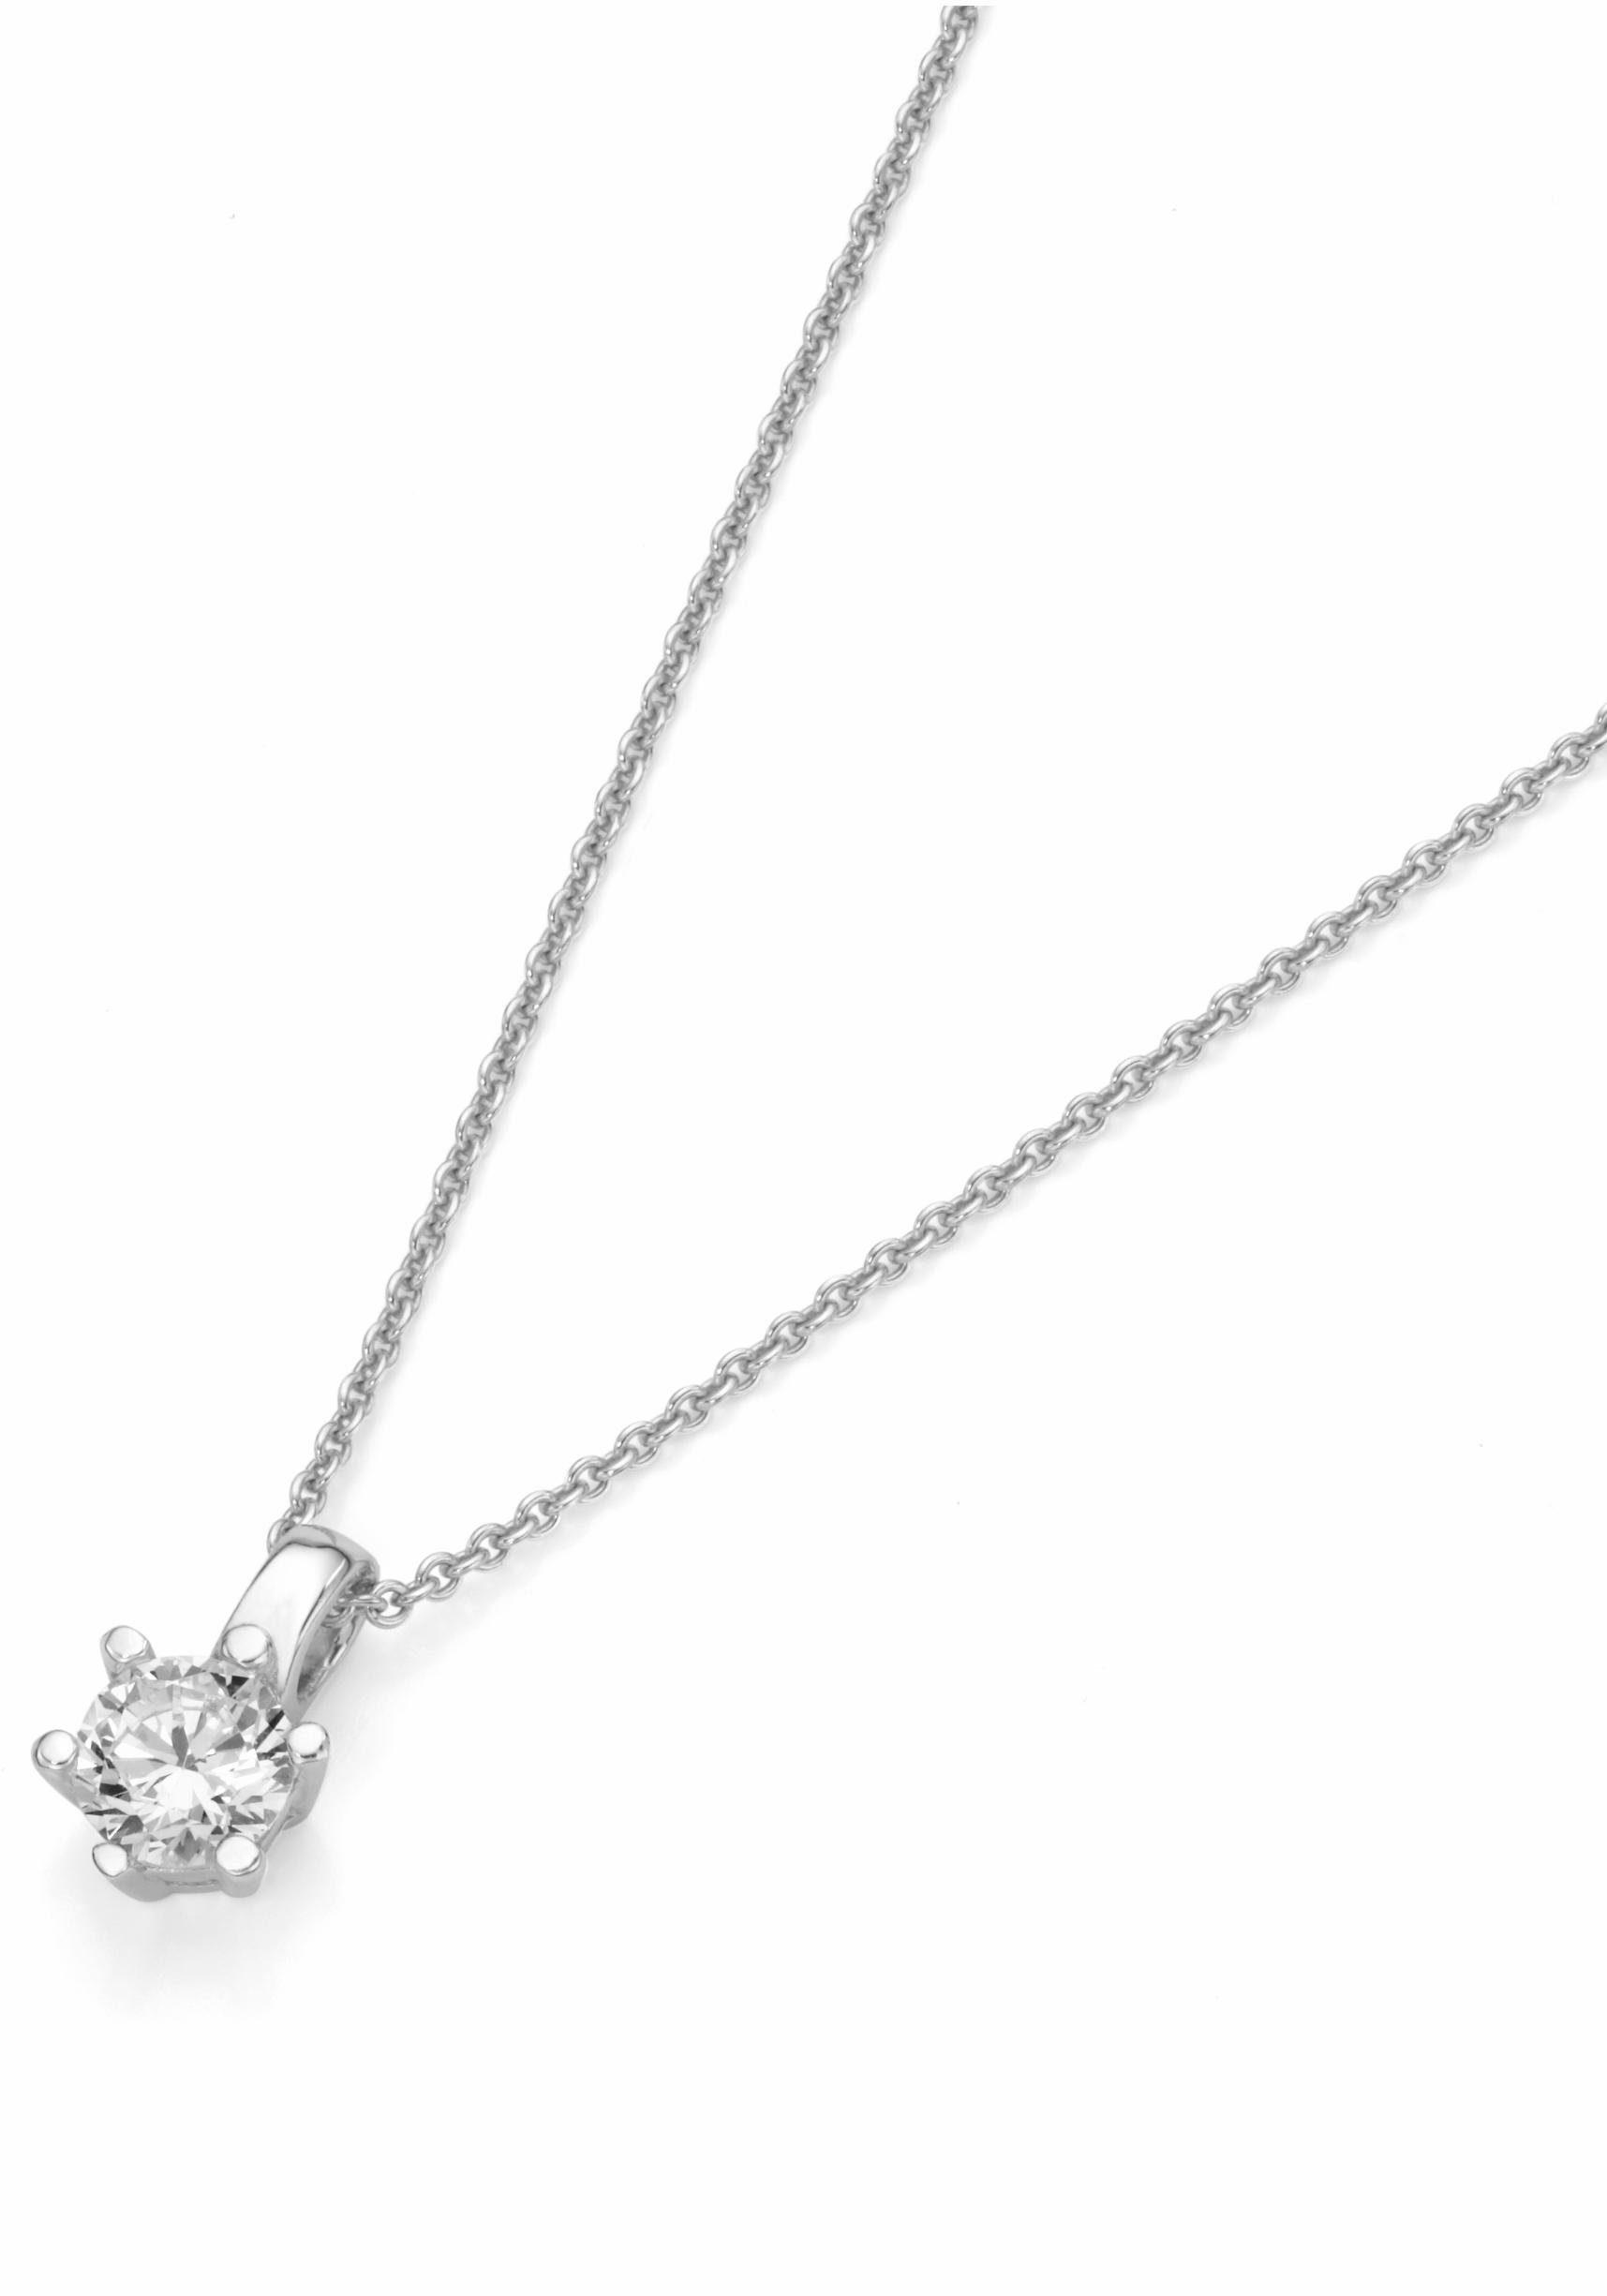 Firetti Silberkette »Solitär« mit Zirkonia